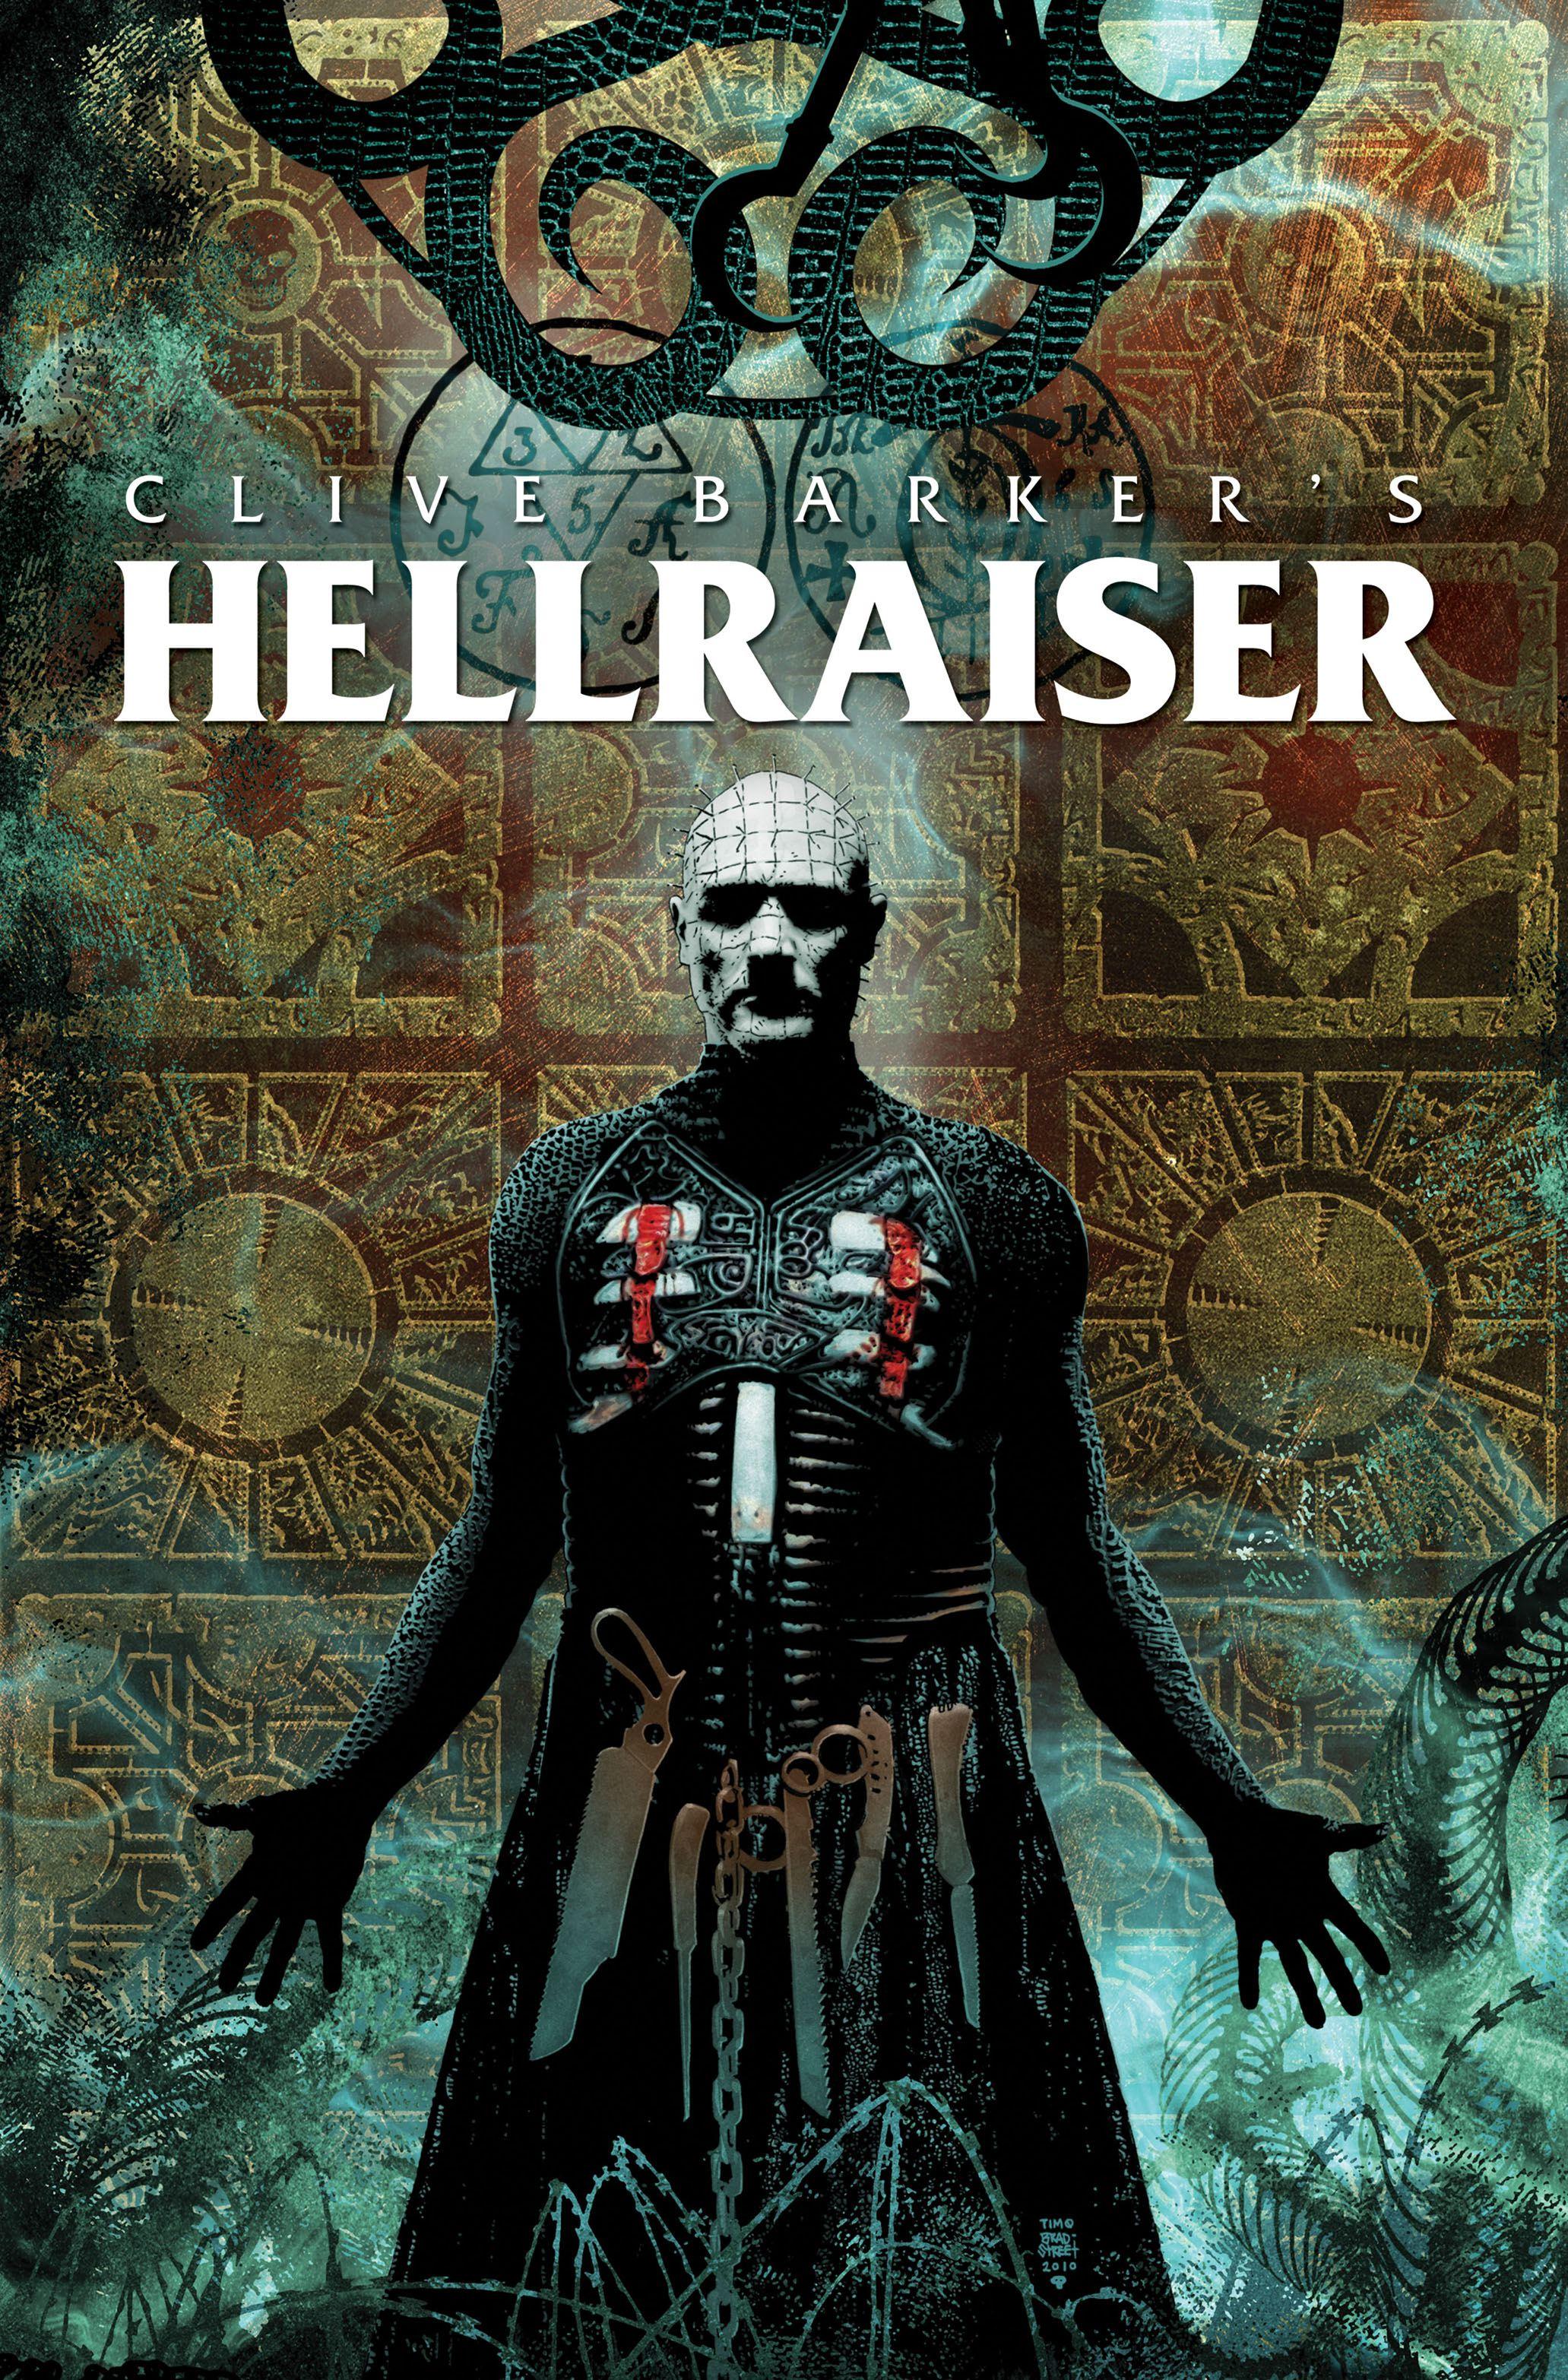 Clive barkers hellraiser vol 1 9781608860722 hr